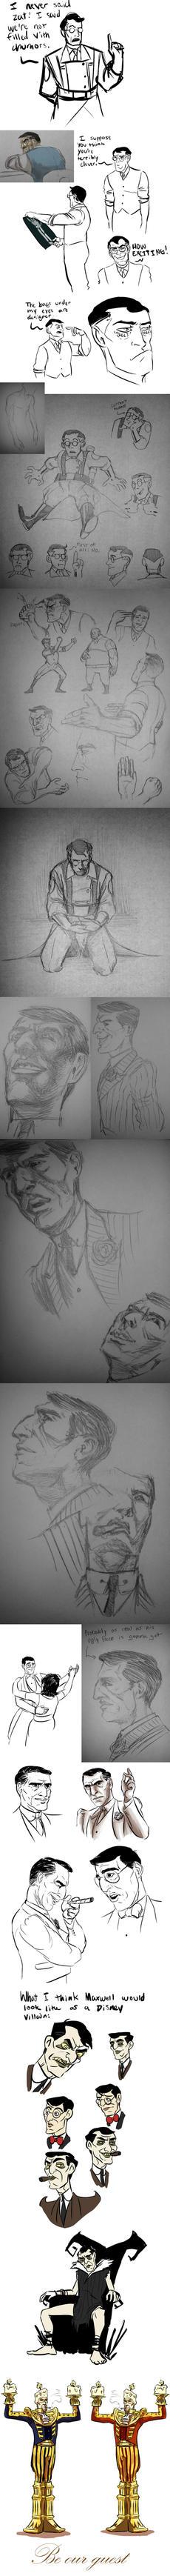 sketchdump 31 by InfamouslyDorky